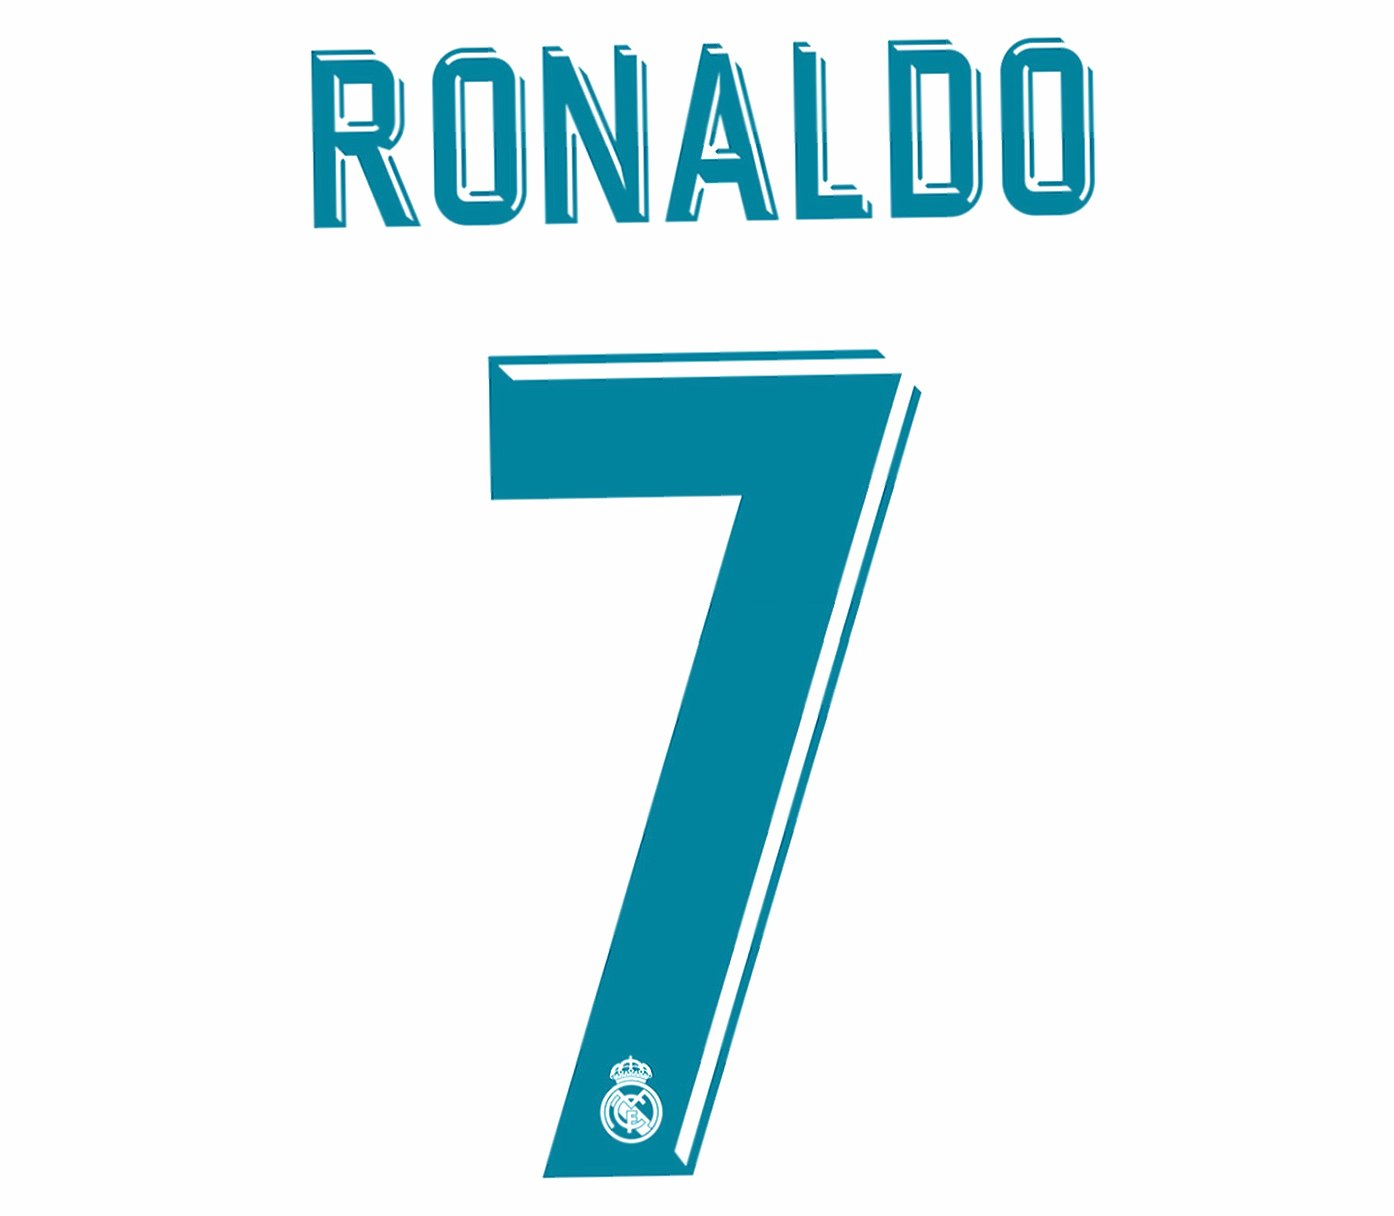 Ronaldo 2017-2018 wallpapers HD quality